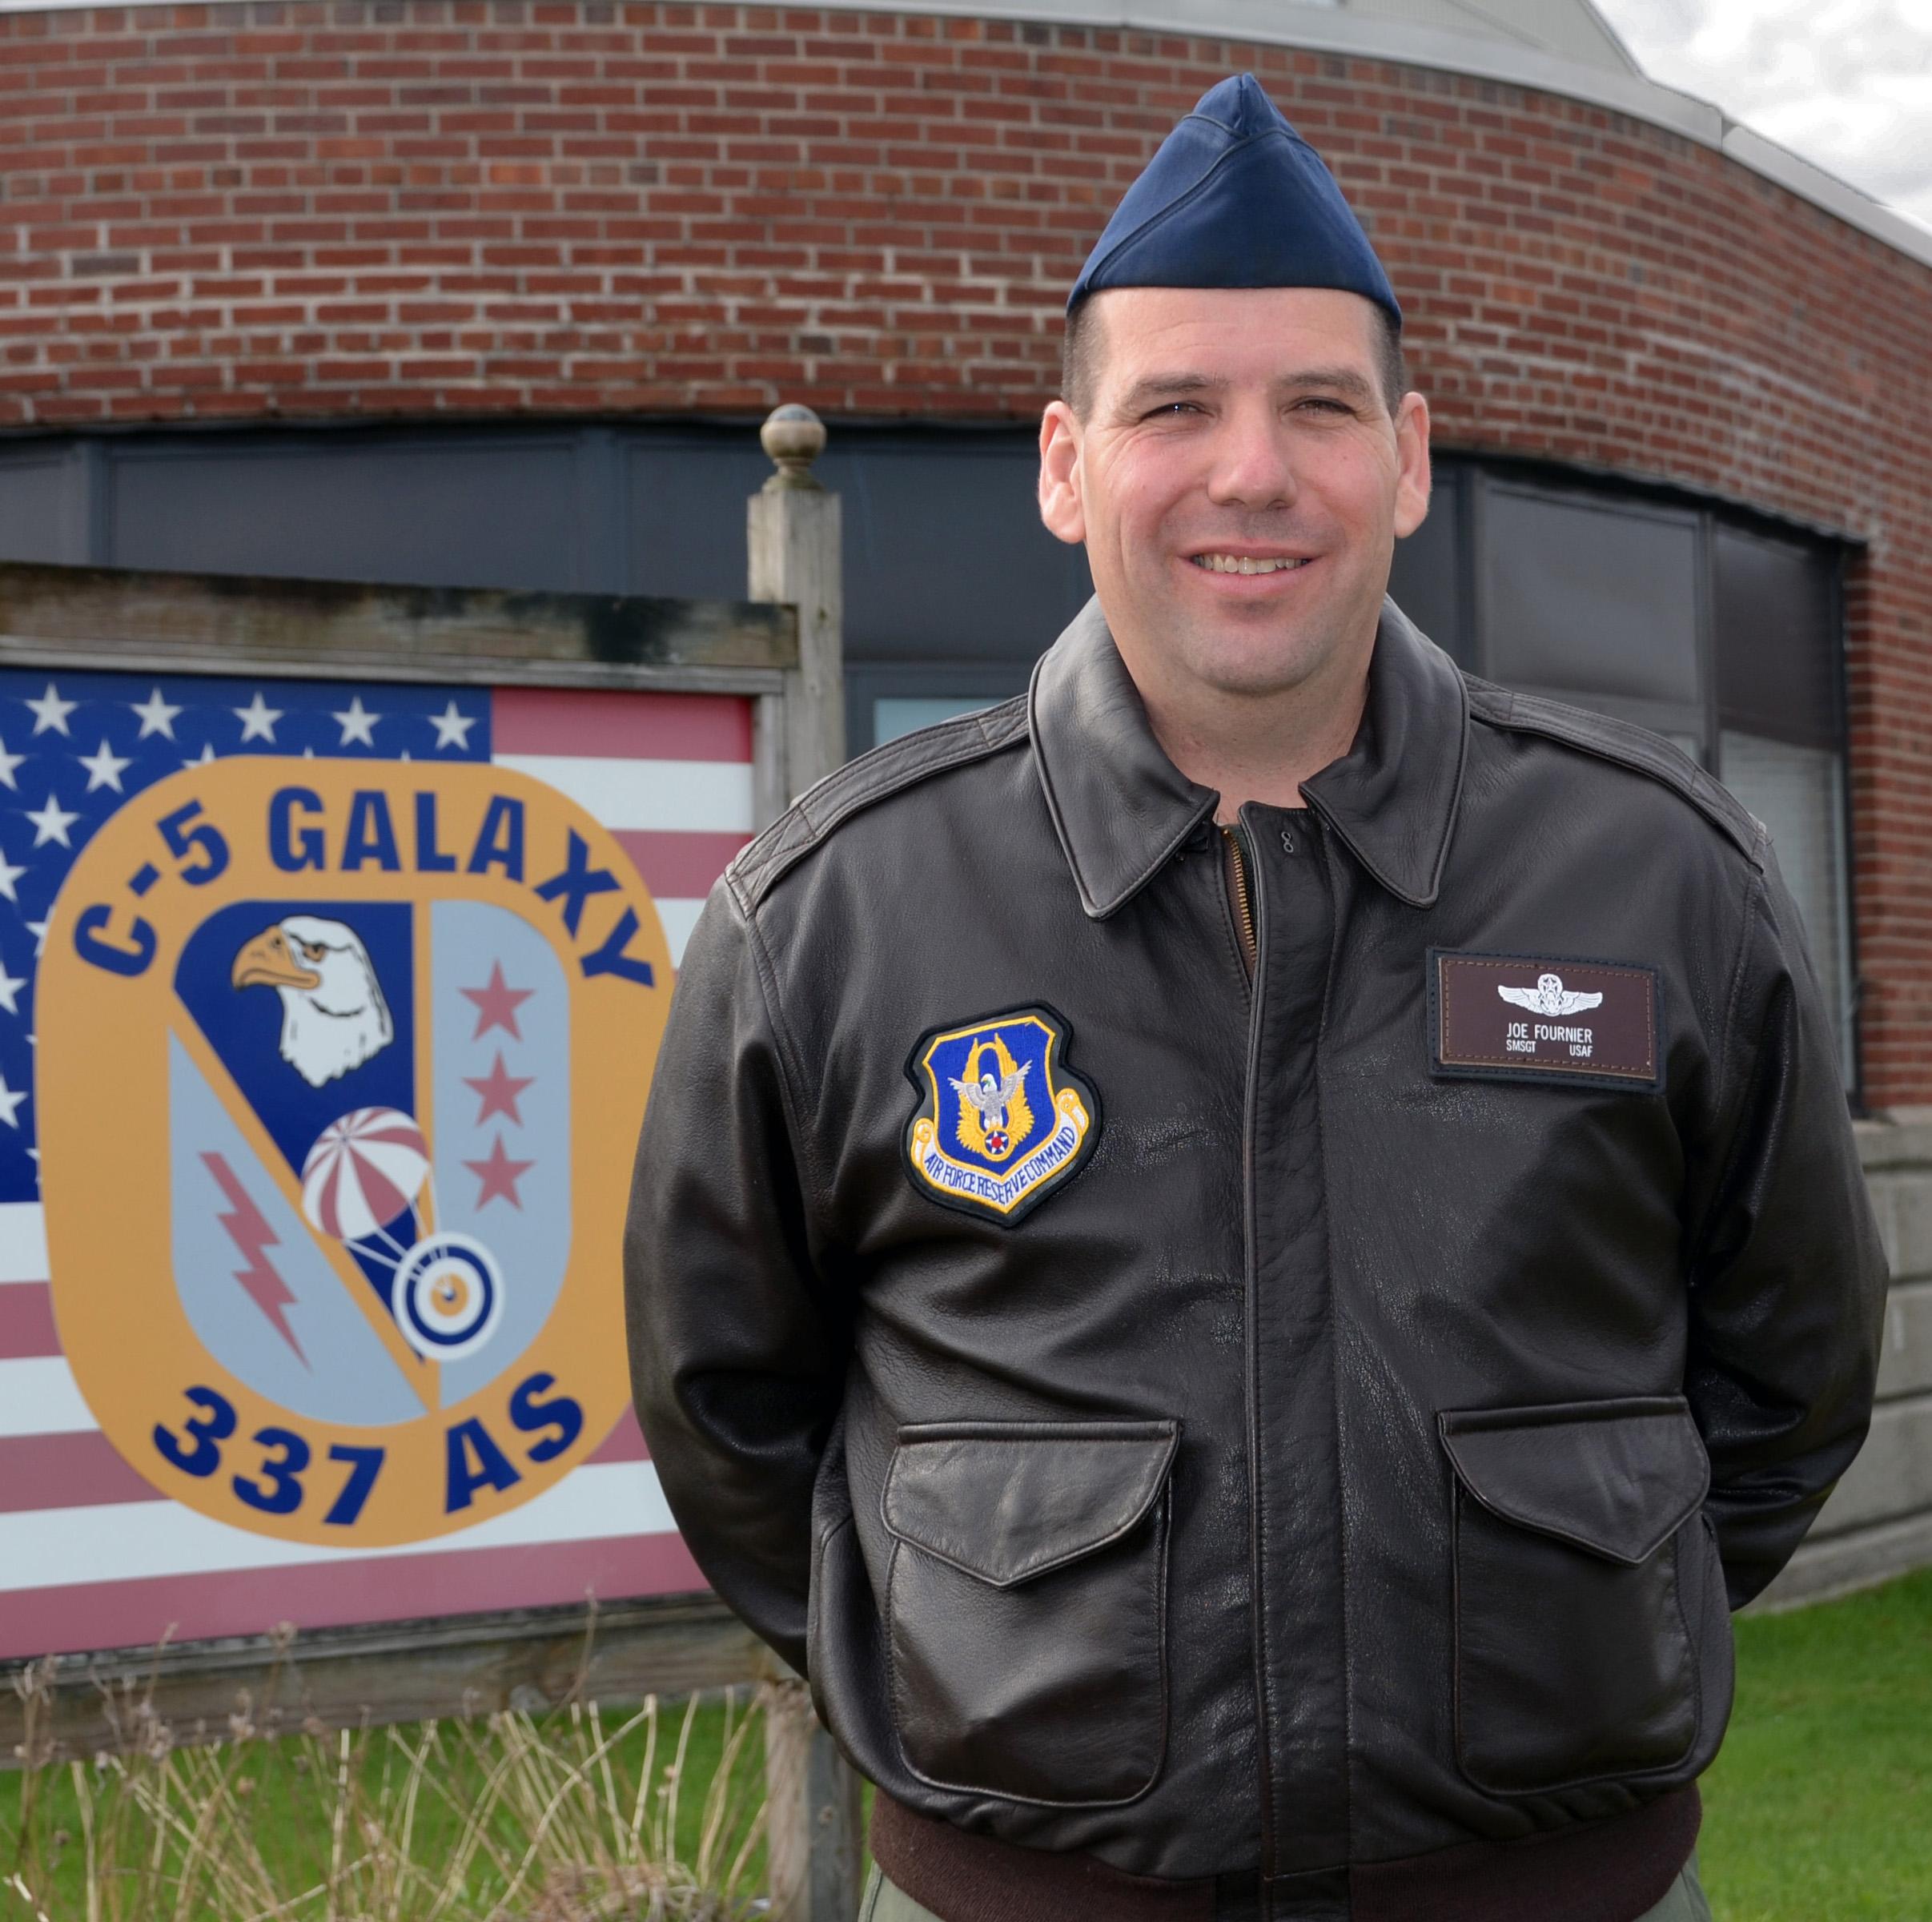 SMSgt. Joe Fournier, 337th Airlift Squadron